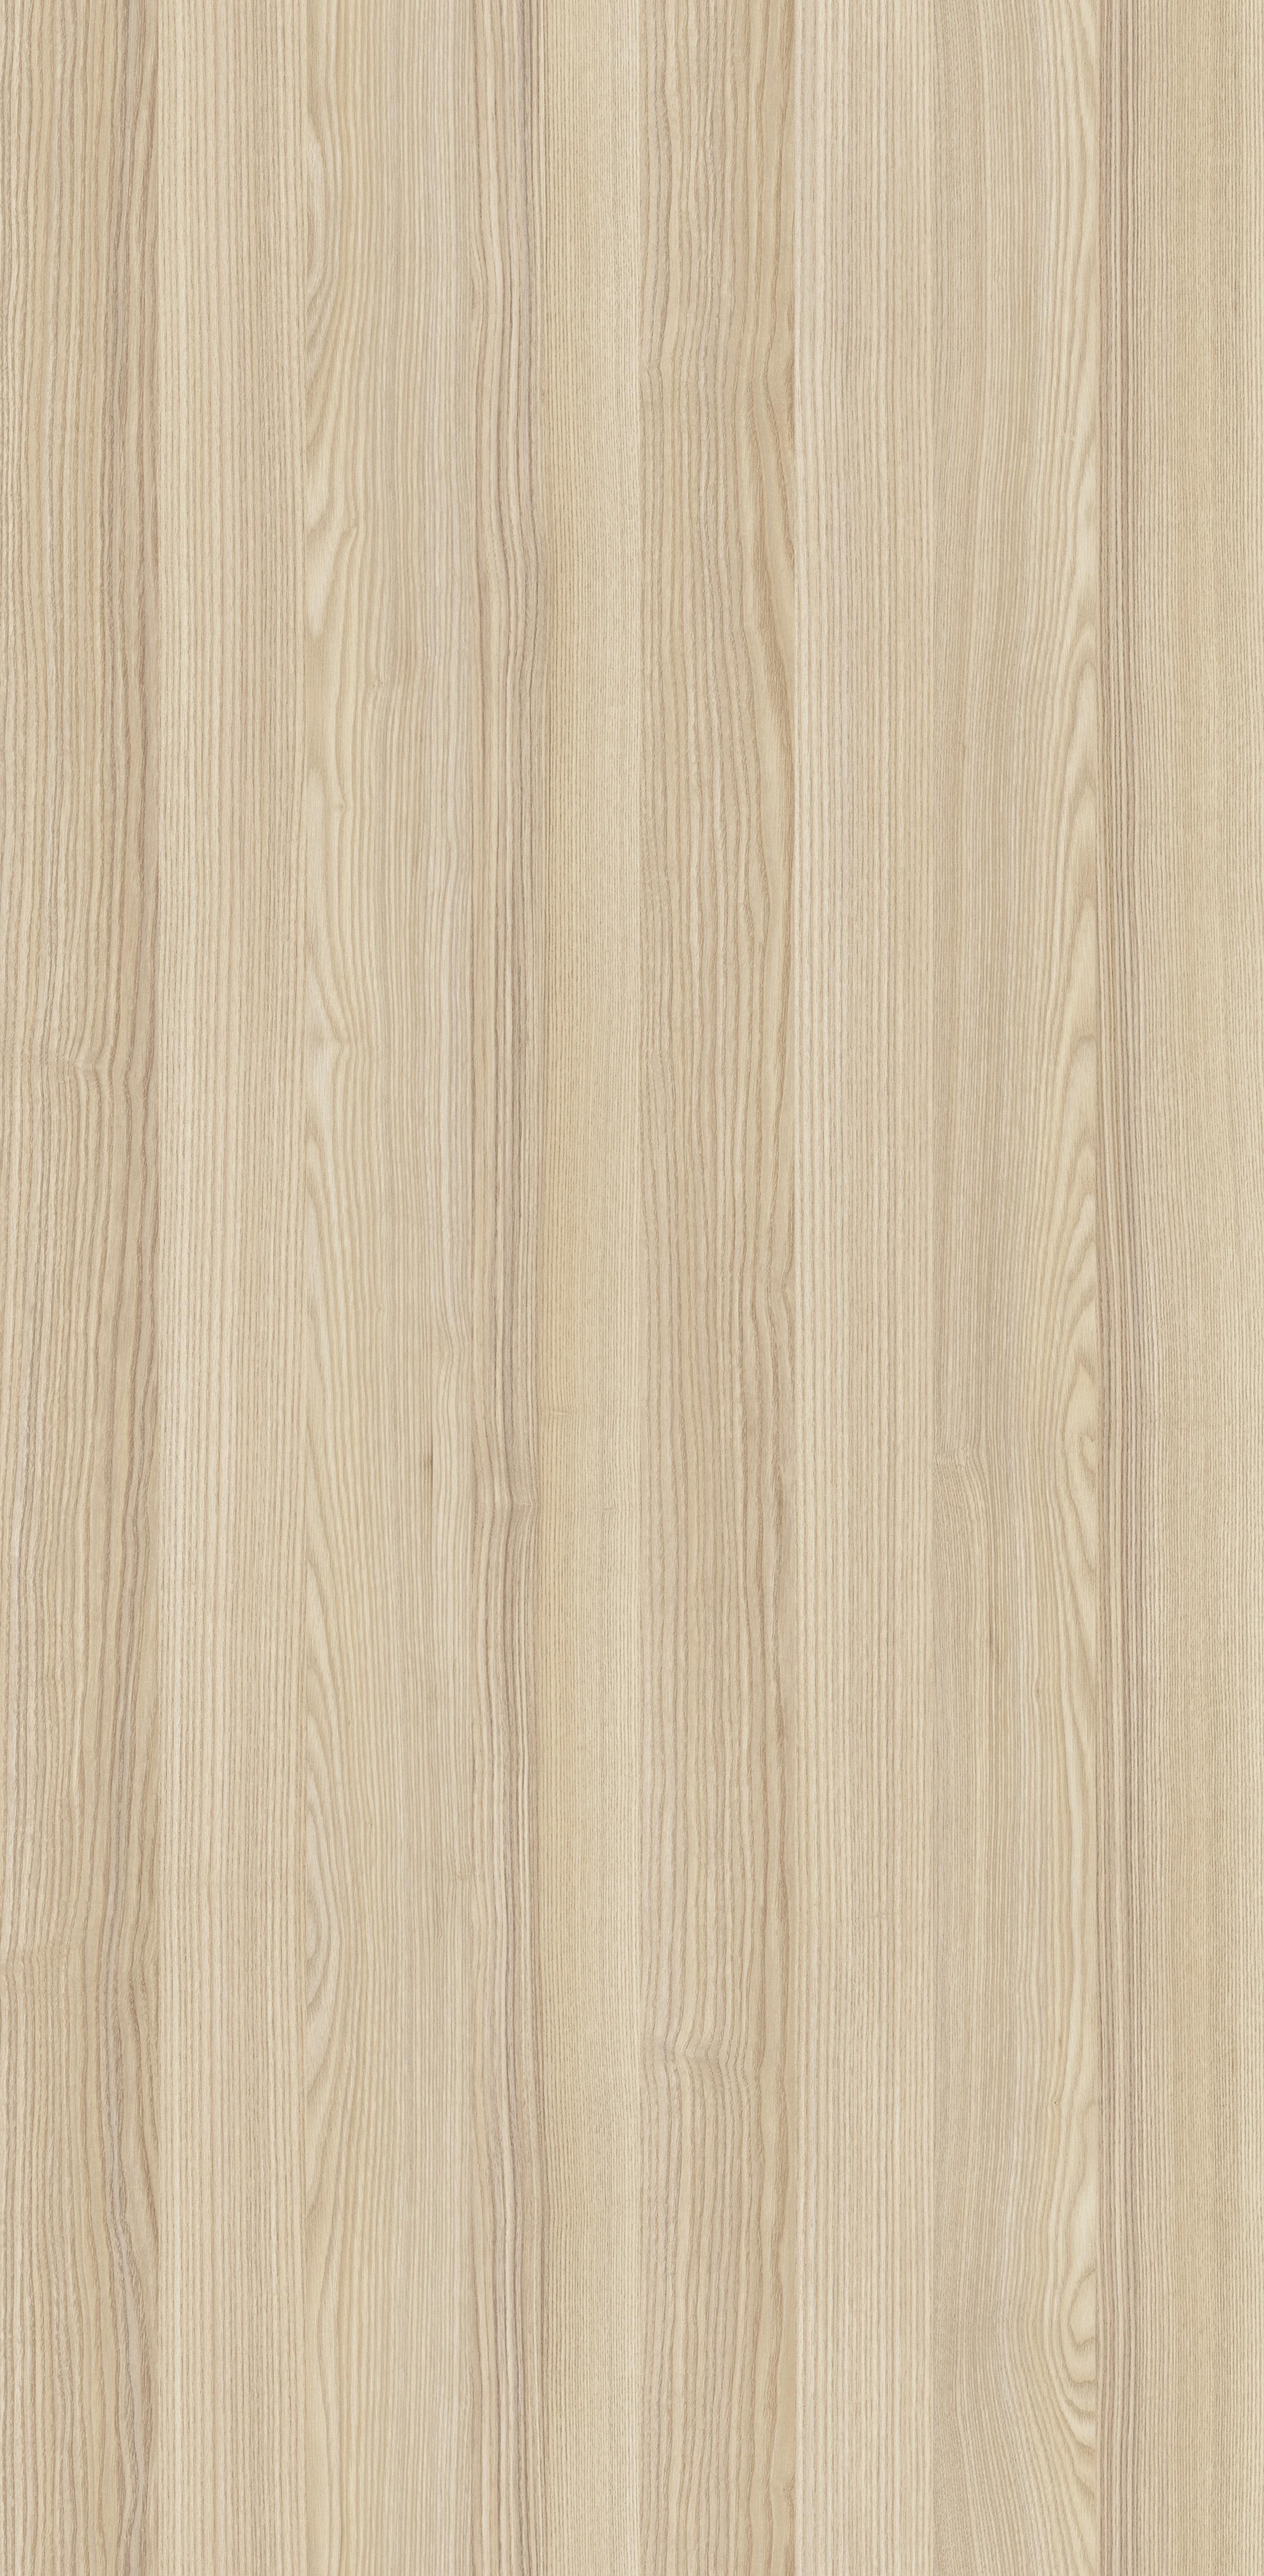 FRESNO COIMBRA M3965